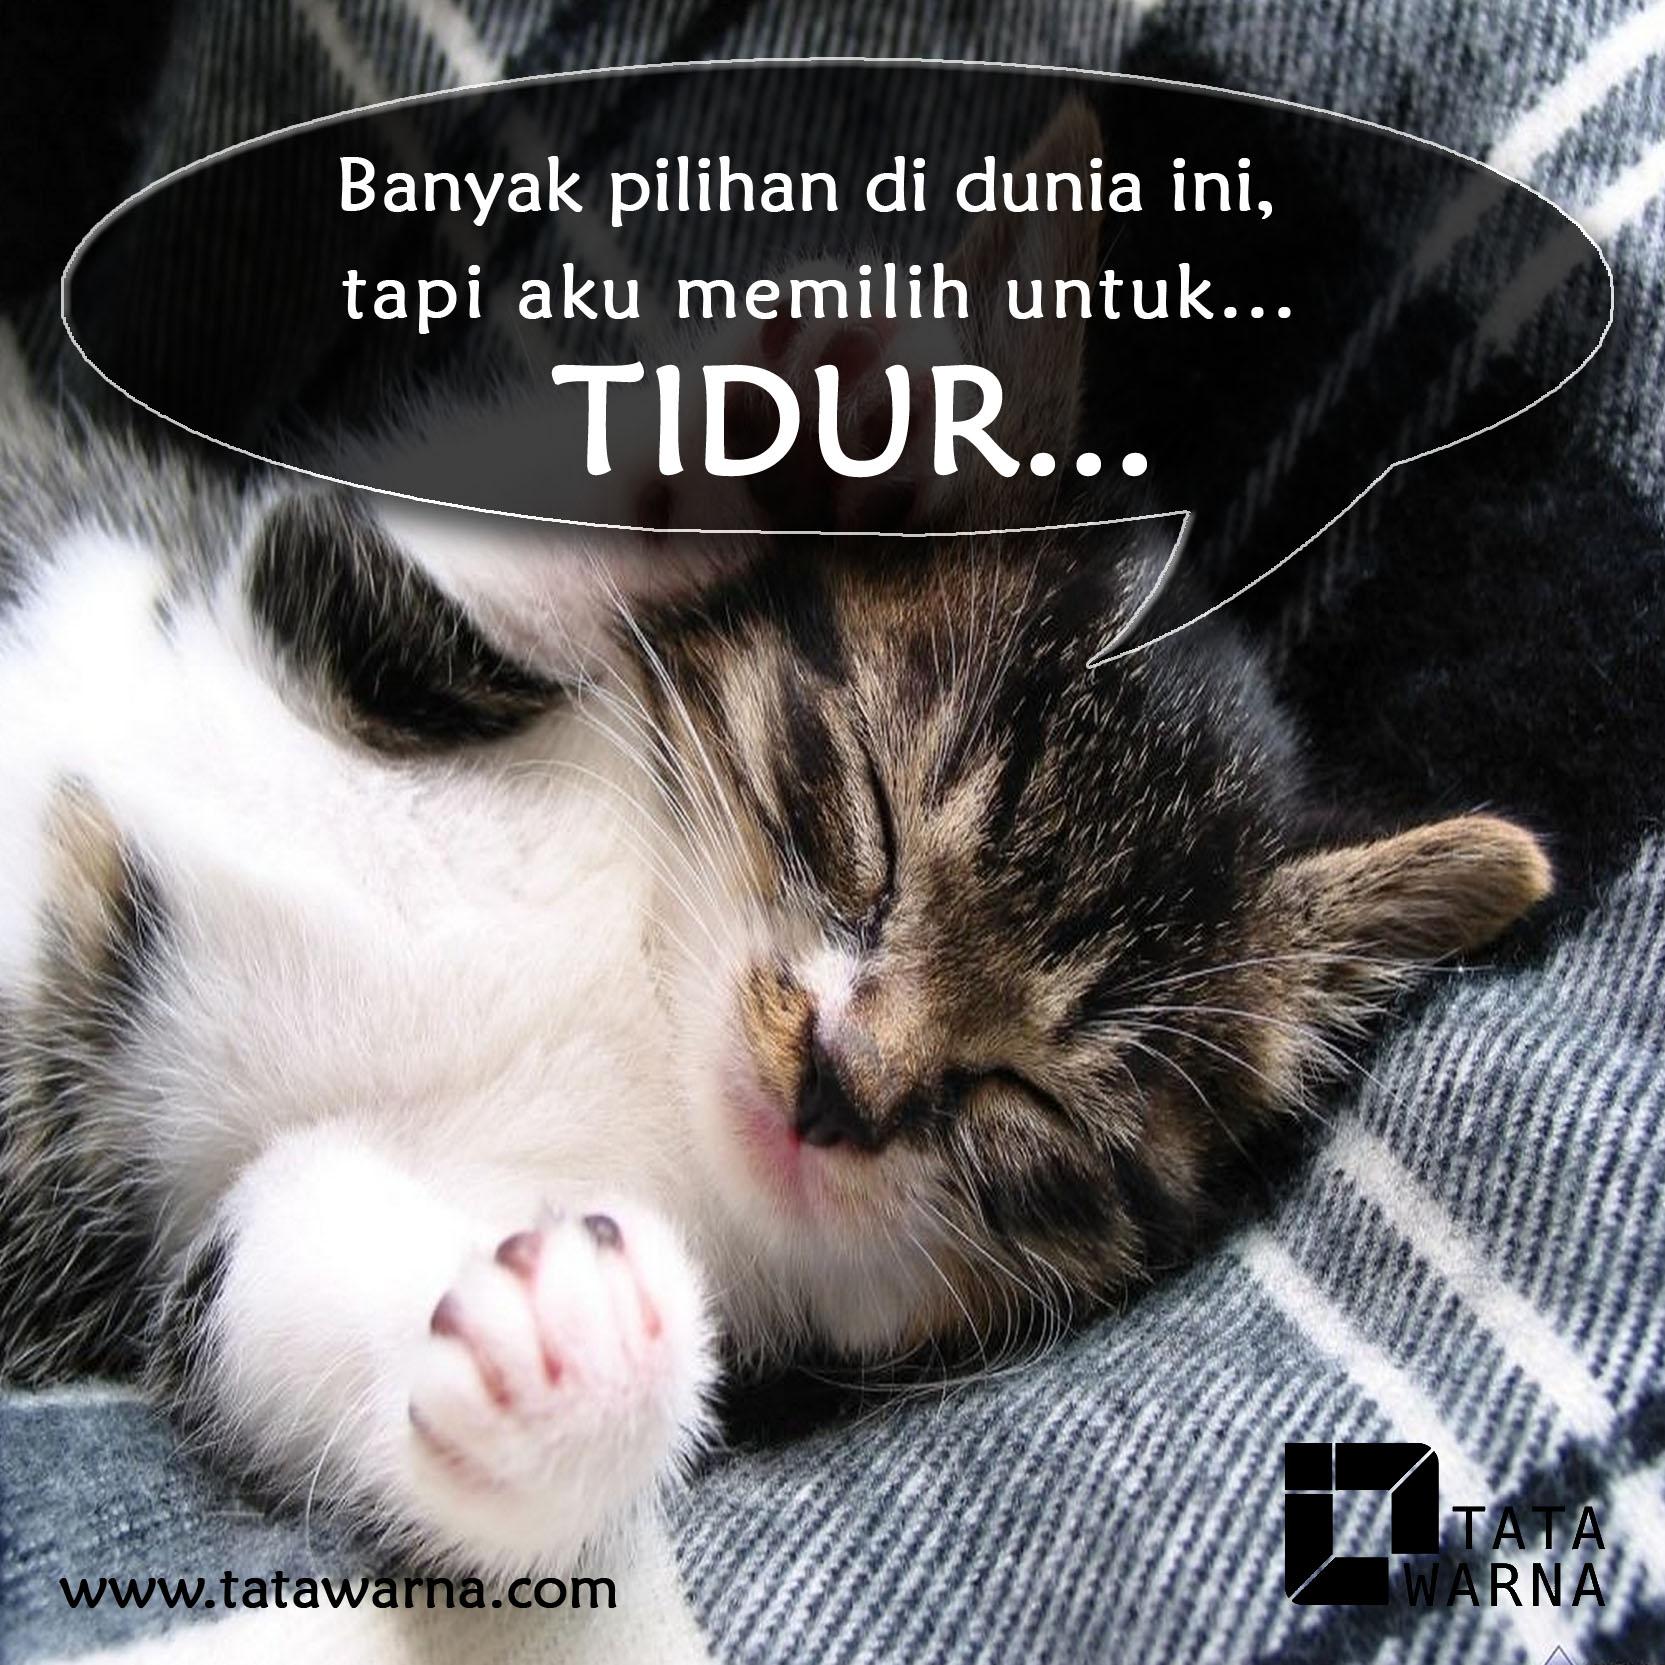 Animasi Kucing Lucu Meme Lucu Kucing Tidur 1665x1665 Download Hd Wallpaper Wallpapertip